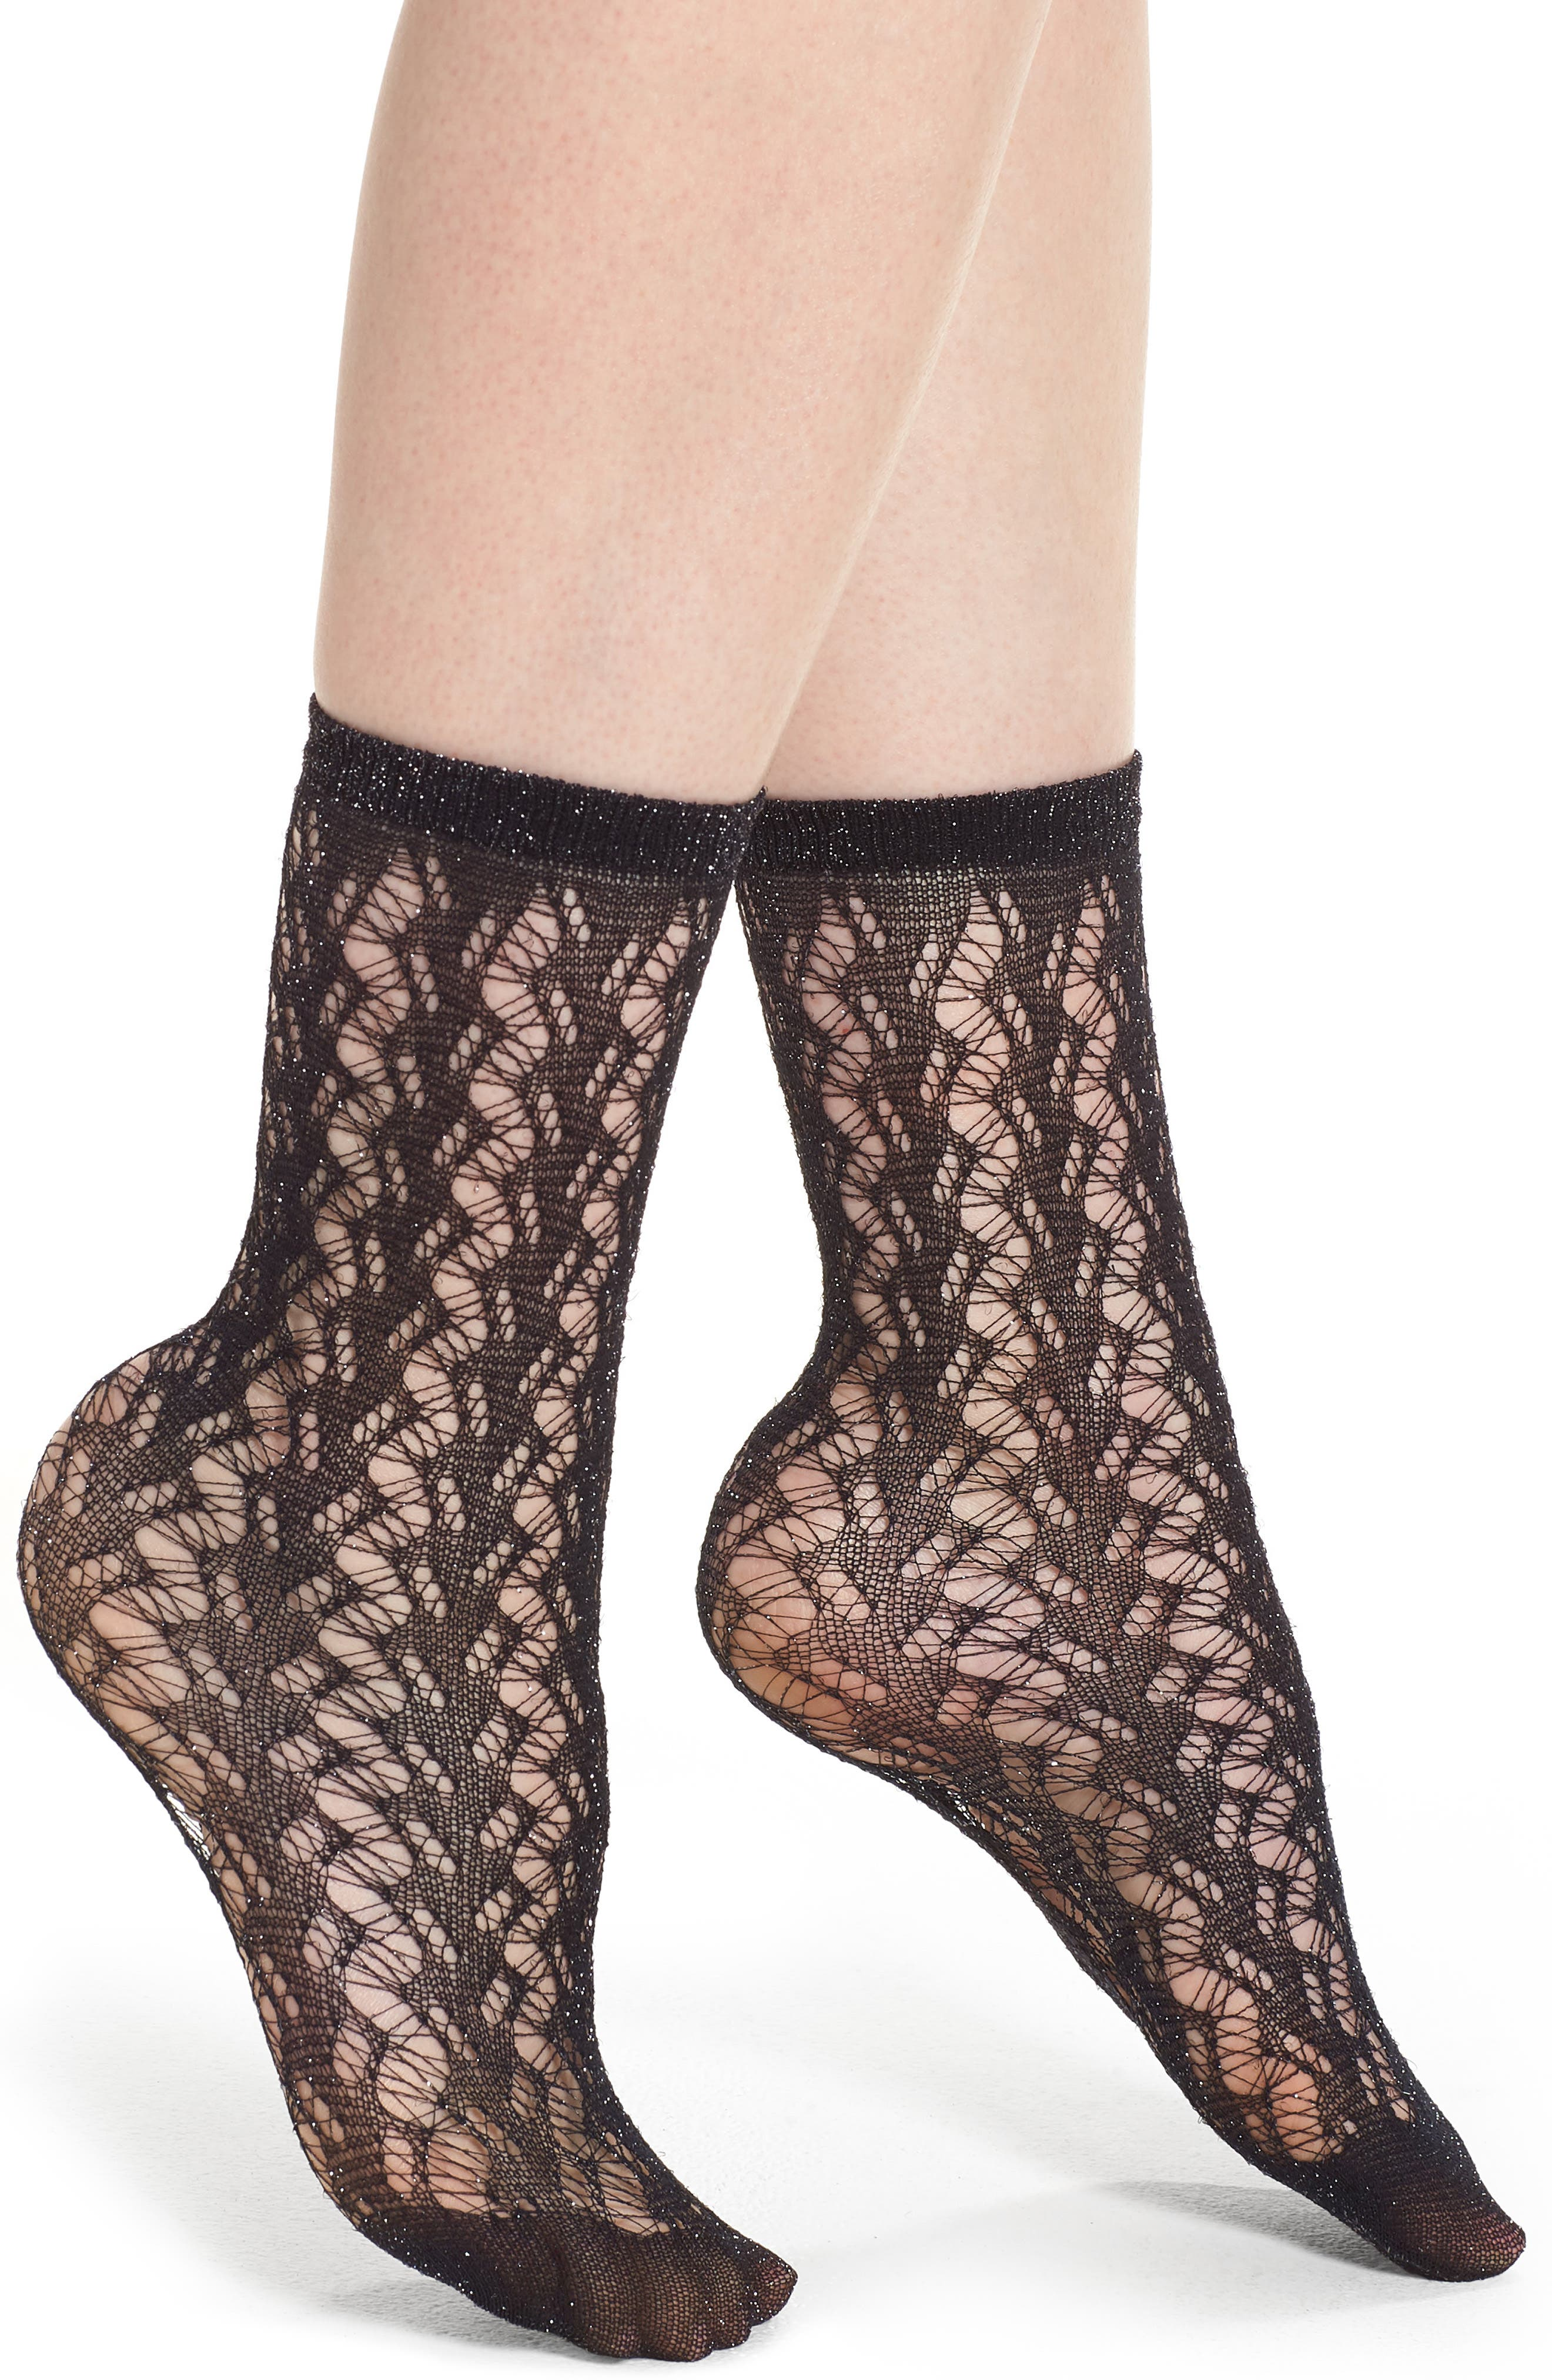 Calzino Glitter Fishnet Trouser Socks,                             Main thumbnail 1, color,                             Black